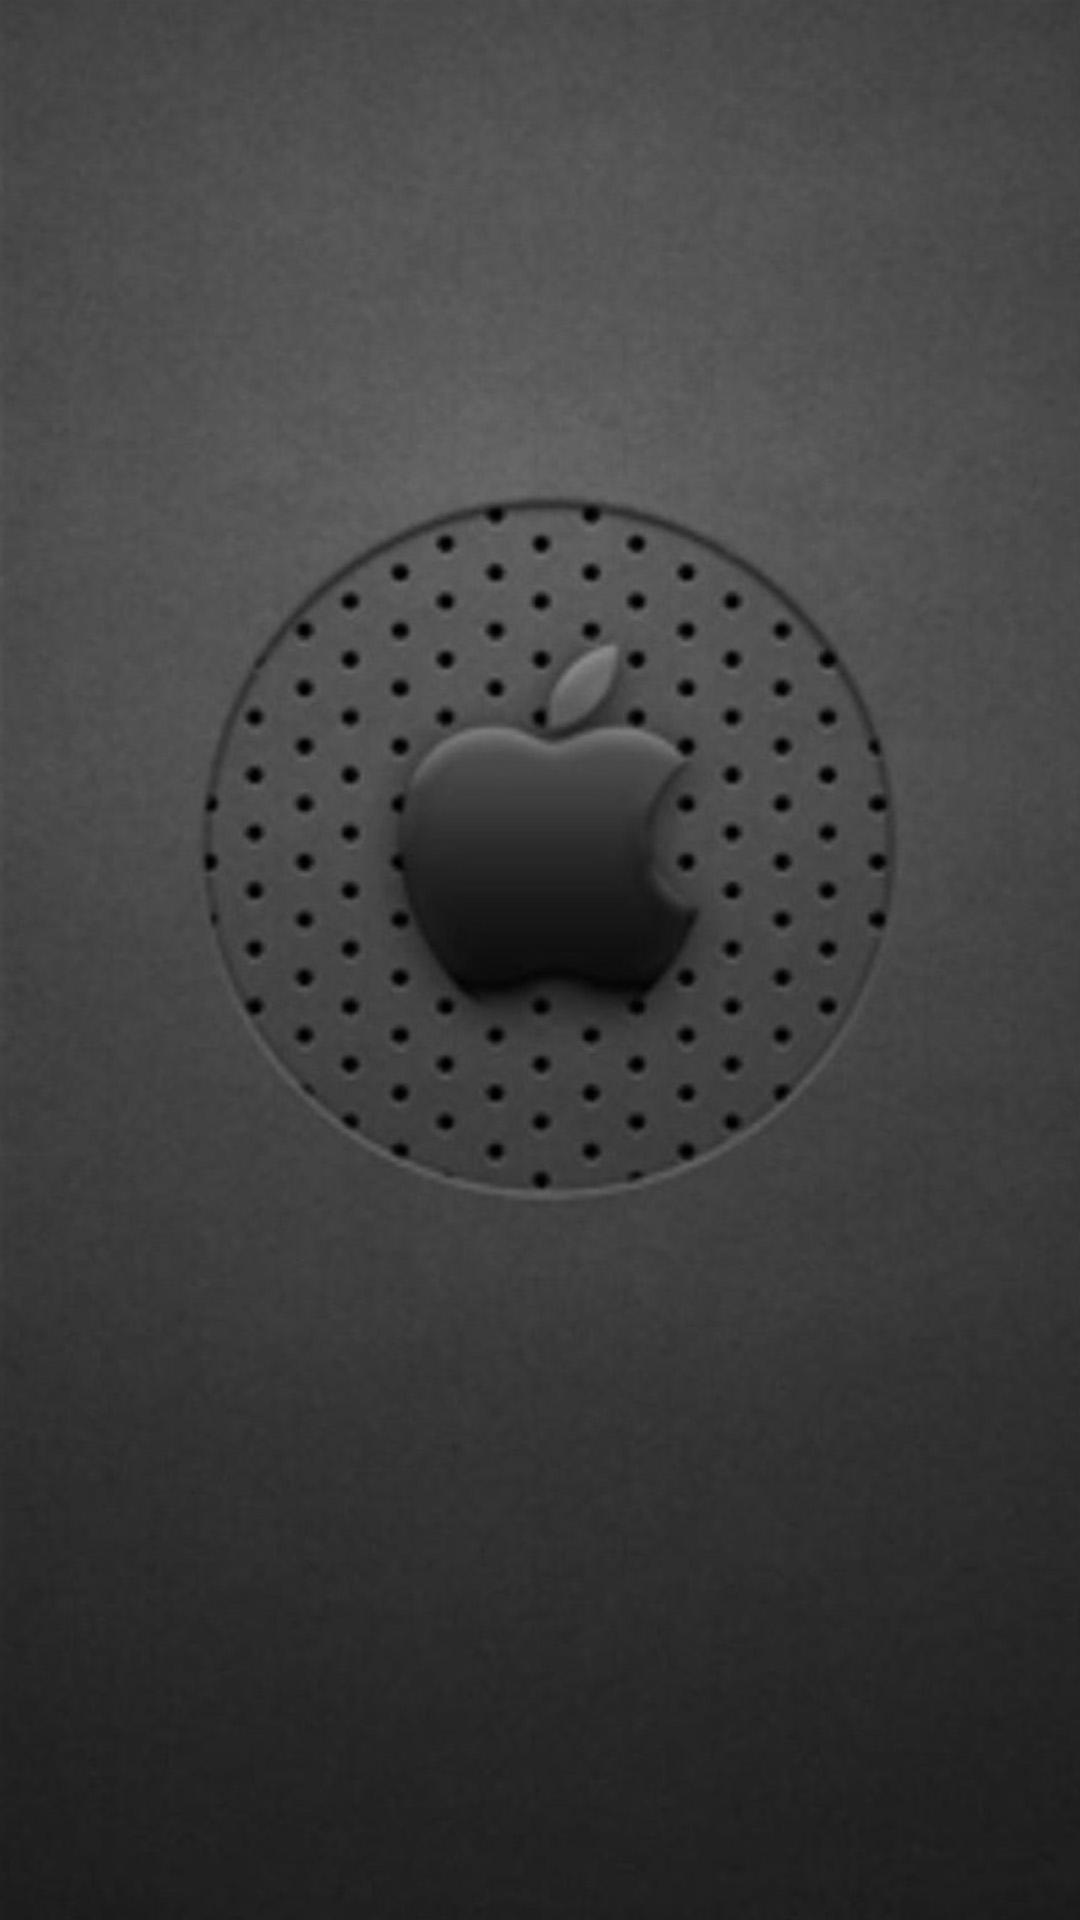 3d Wallpaper apple iphone 6 plus wallpaper 3 - Supportive Guru